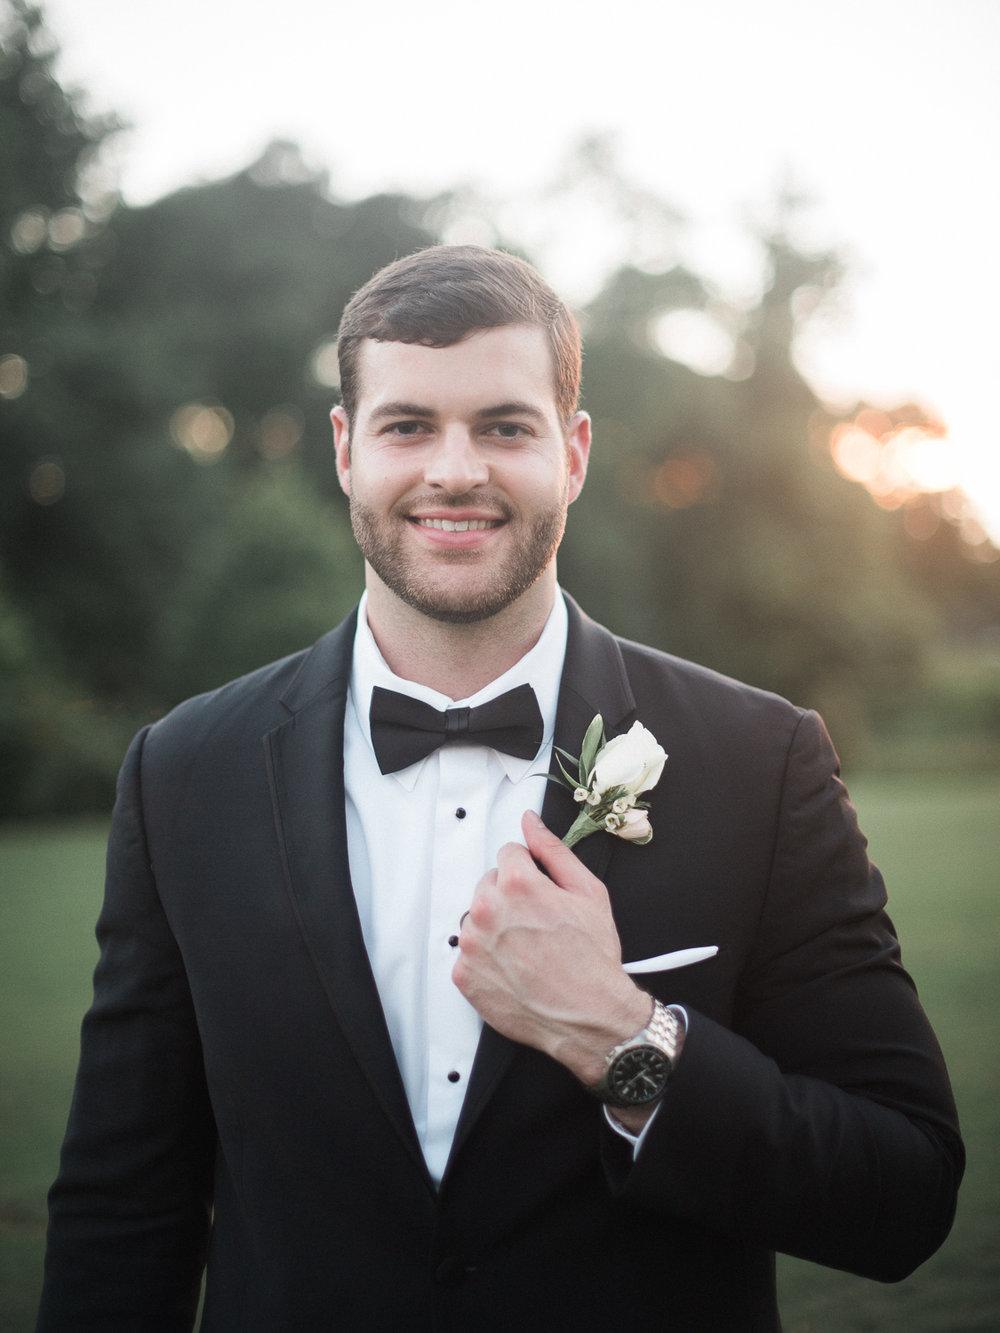 alexgreg-wedding-sunsetphotos-christinadavisphoto76.jpg